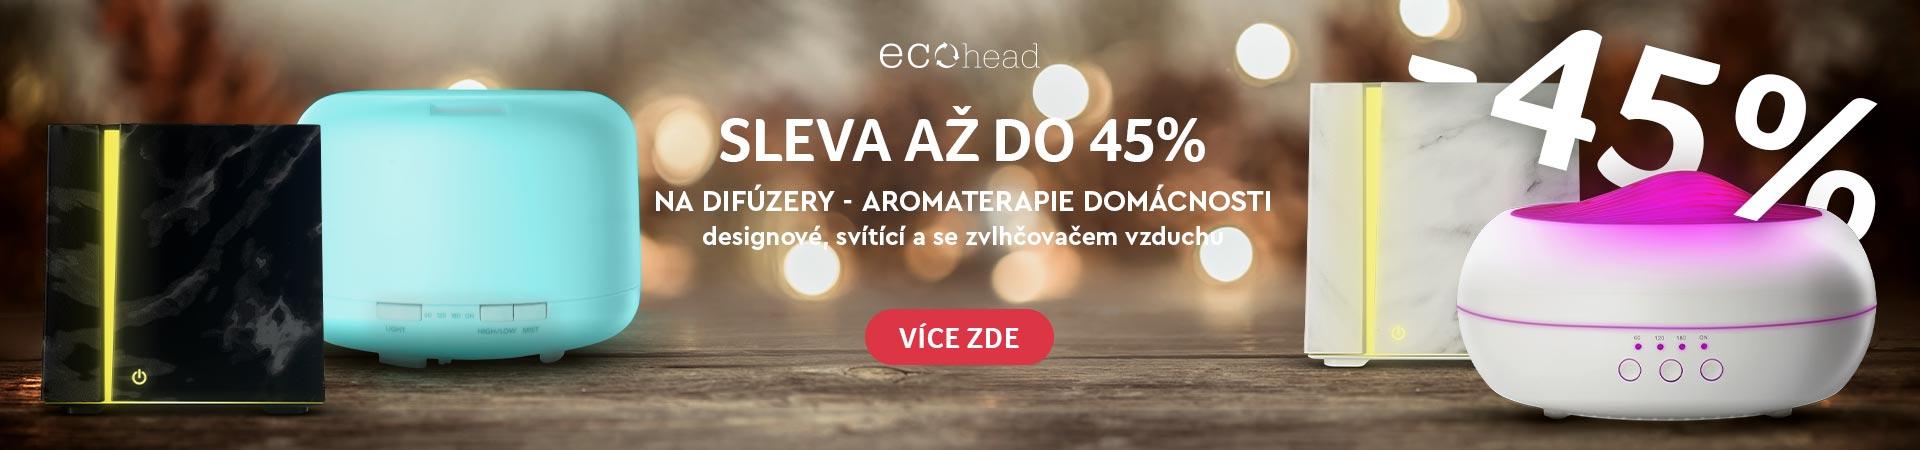 Ecohead difuzor